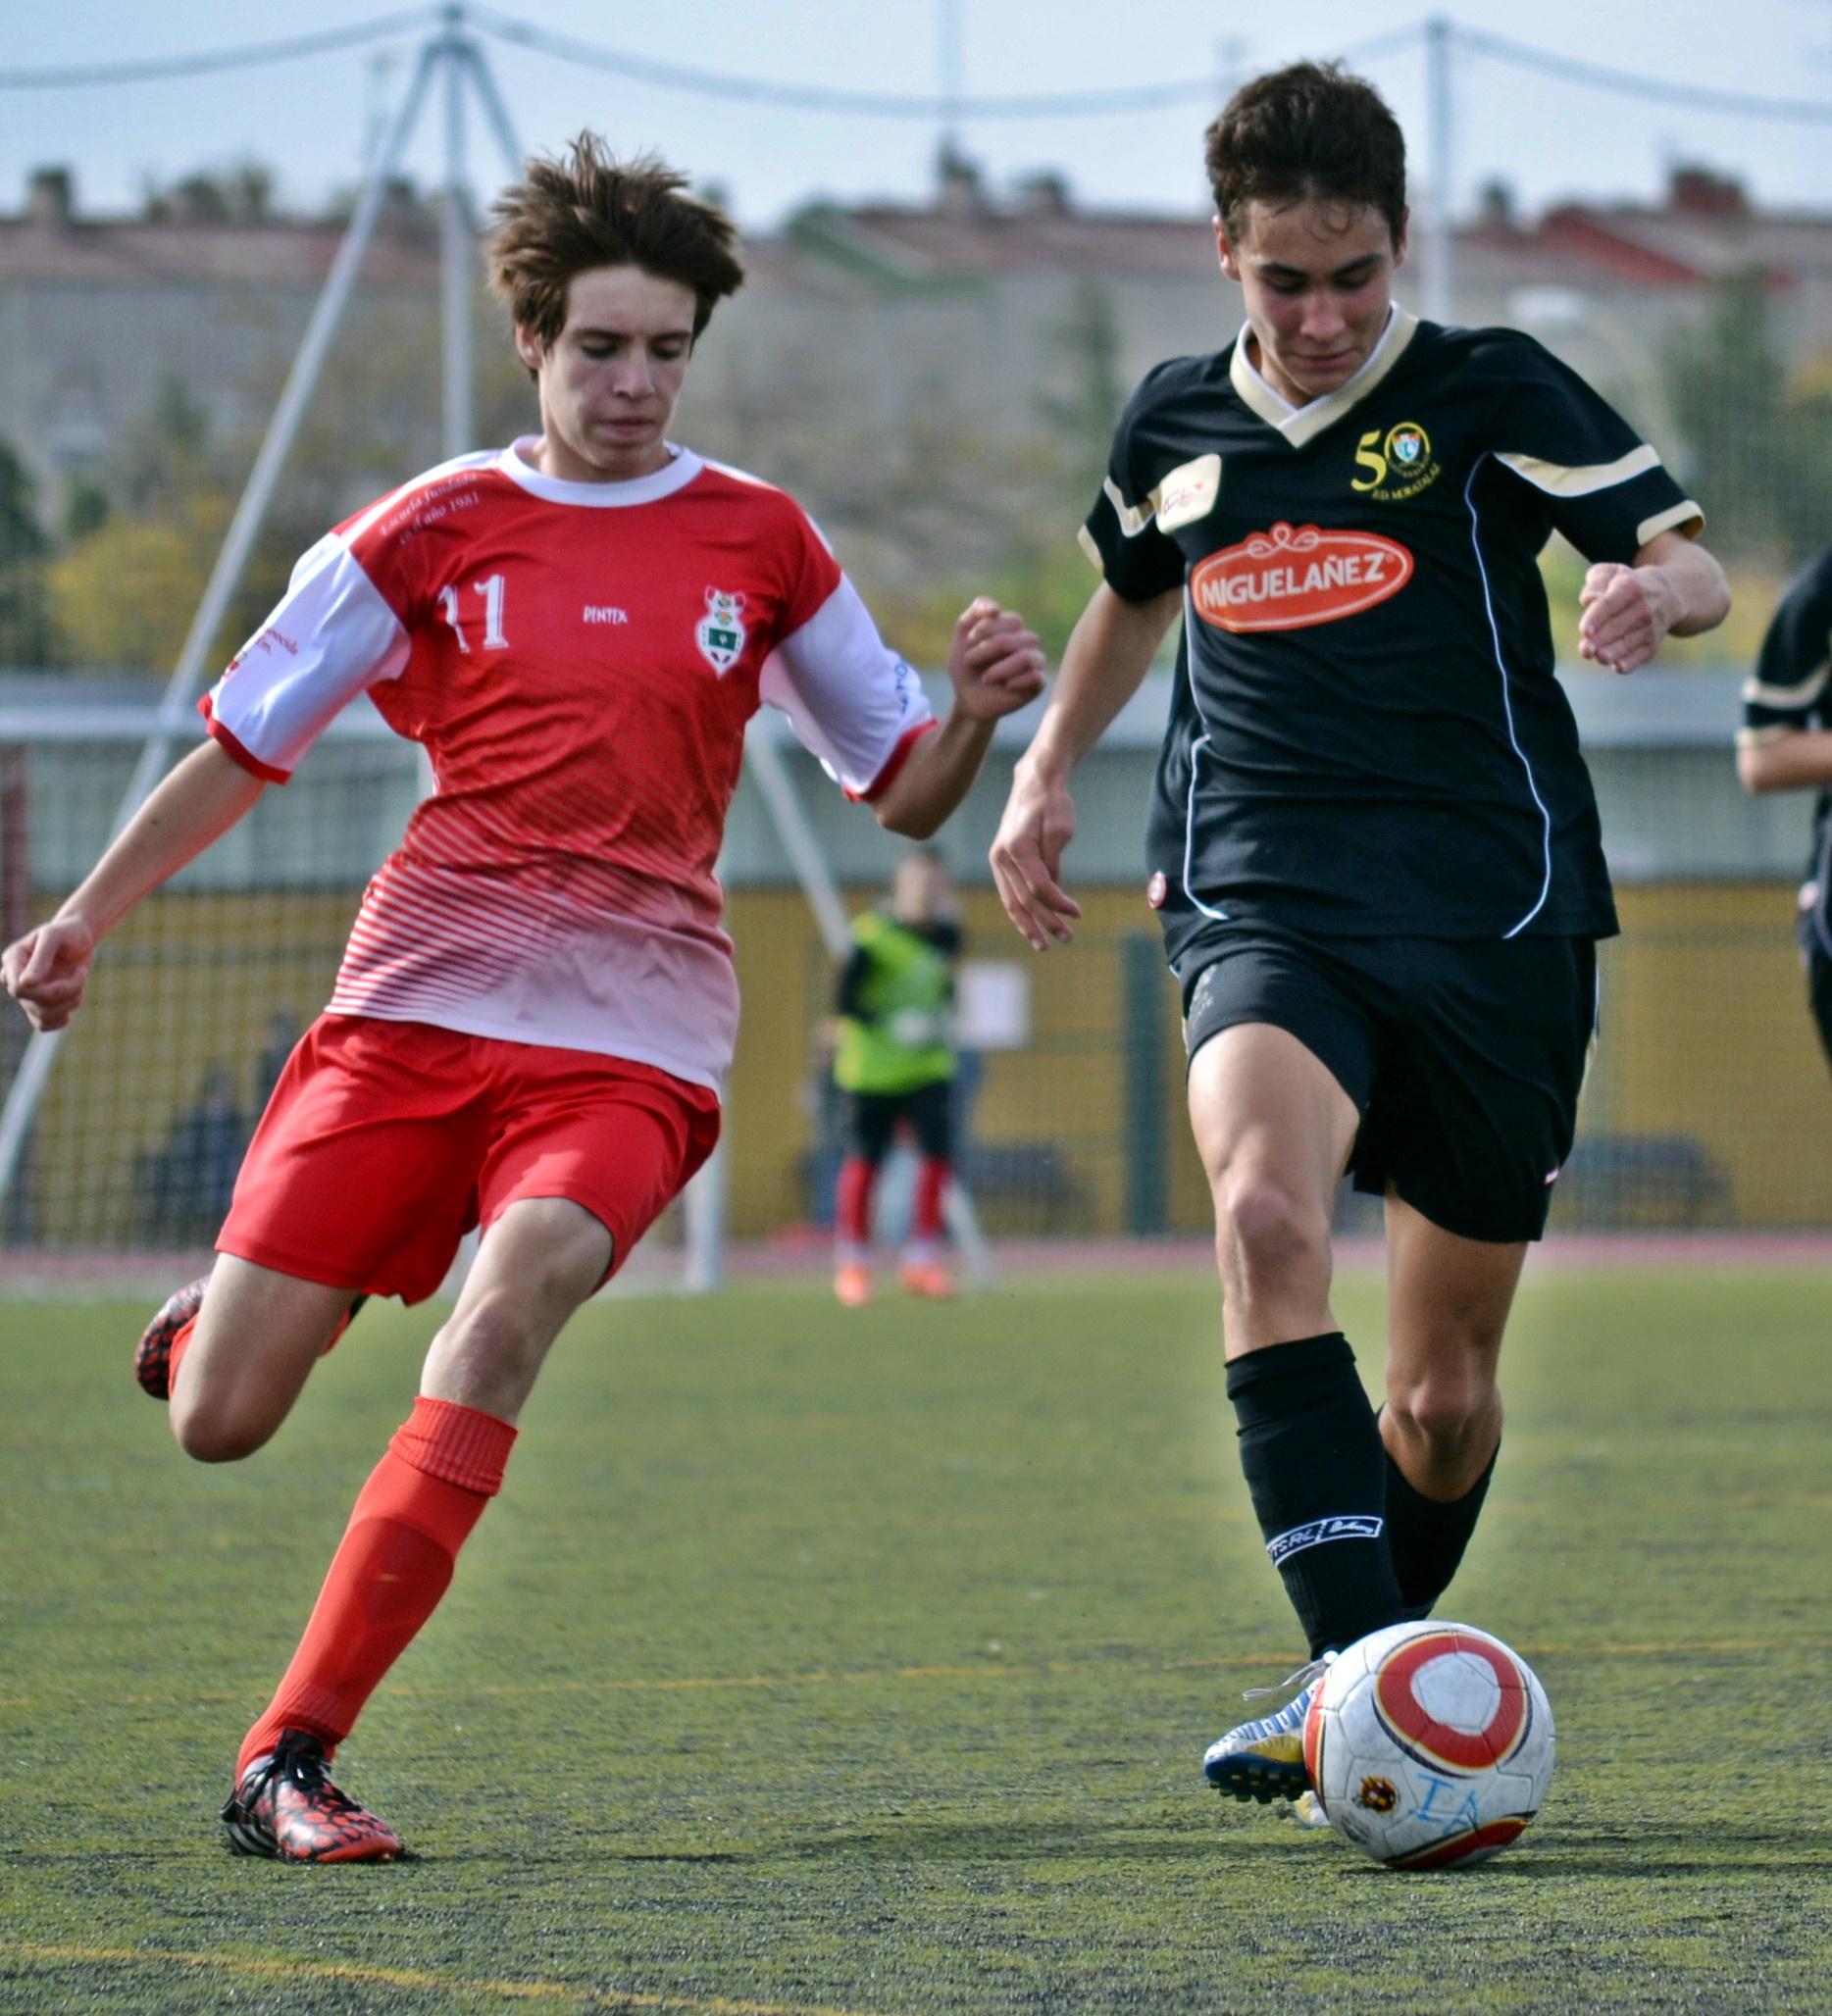 EF Vicálvaro A 0 – 7 EDM Cadete B